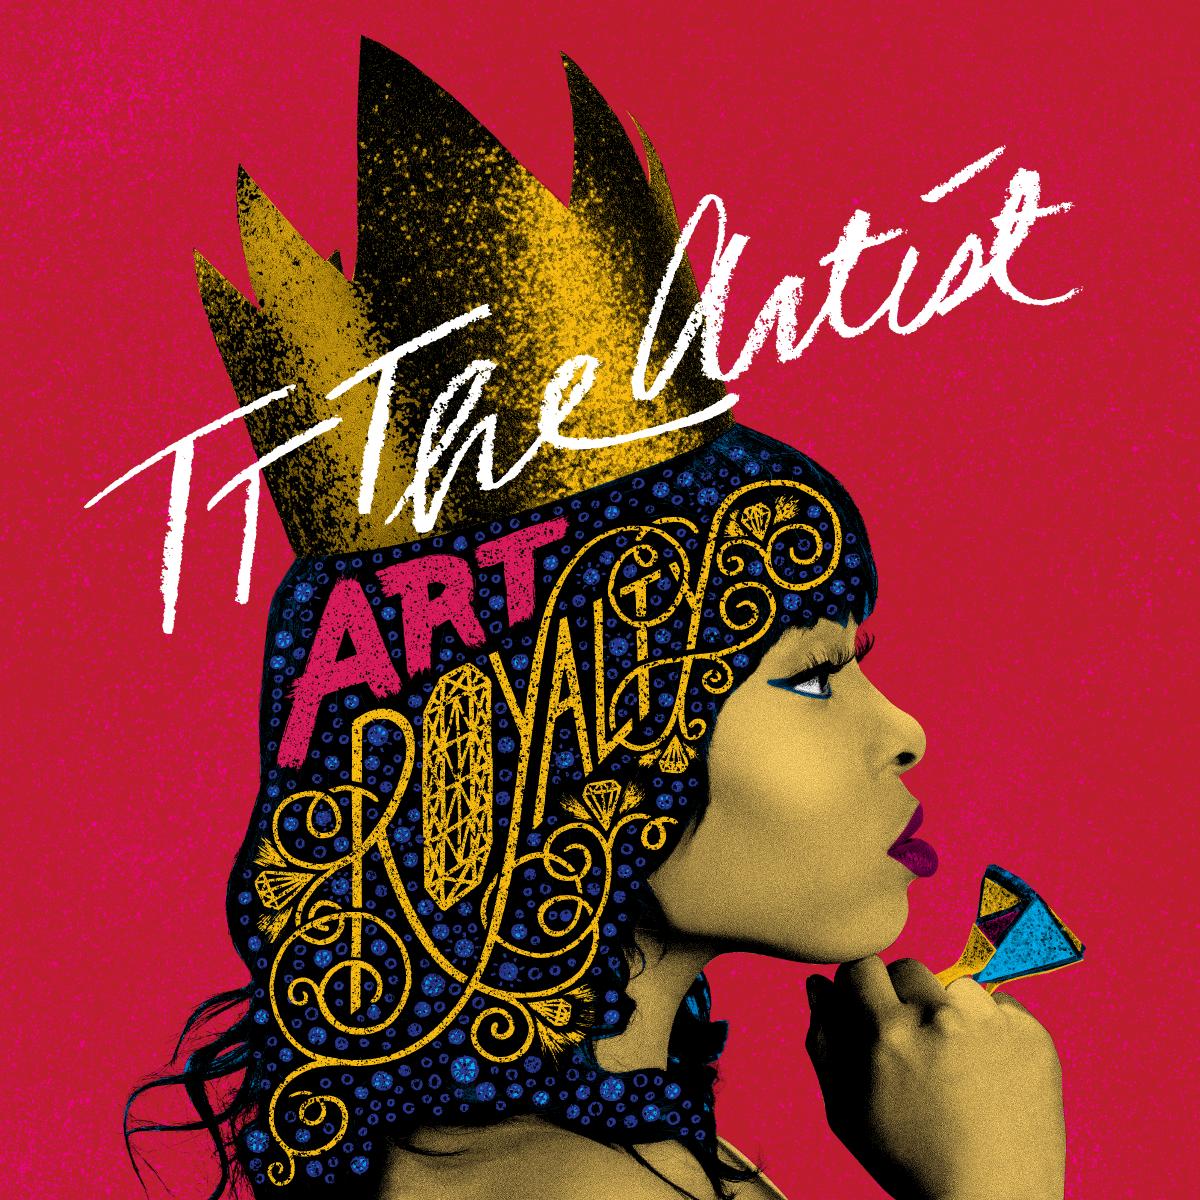 Art-Royalty-CoverTT-The-Artist